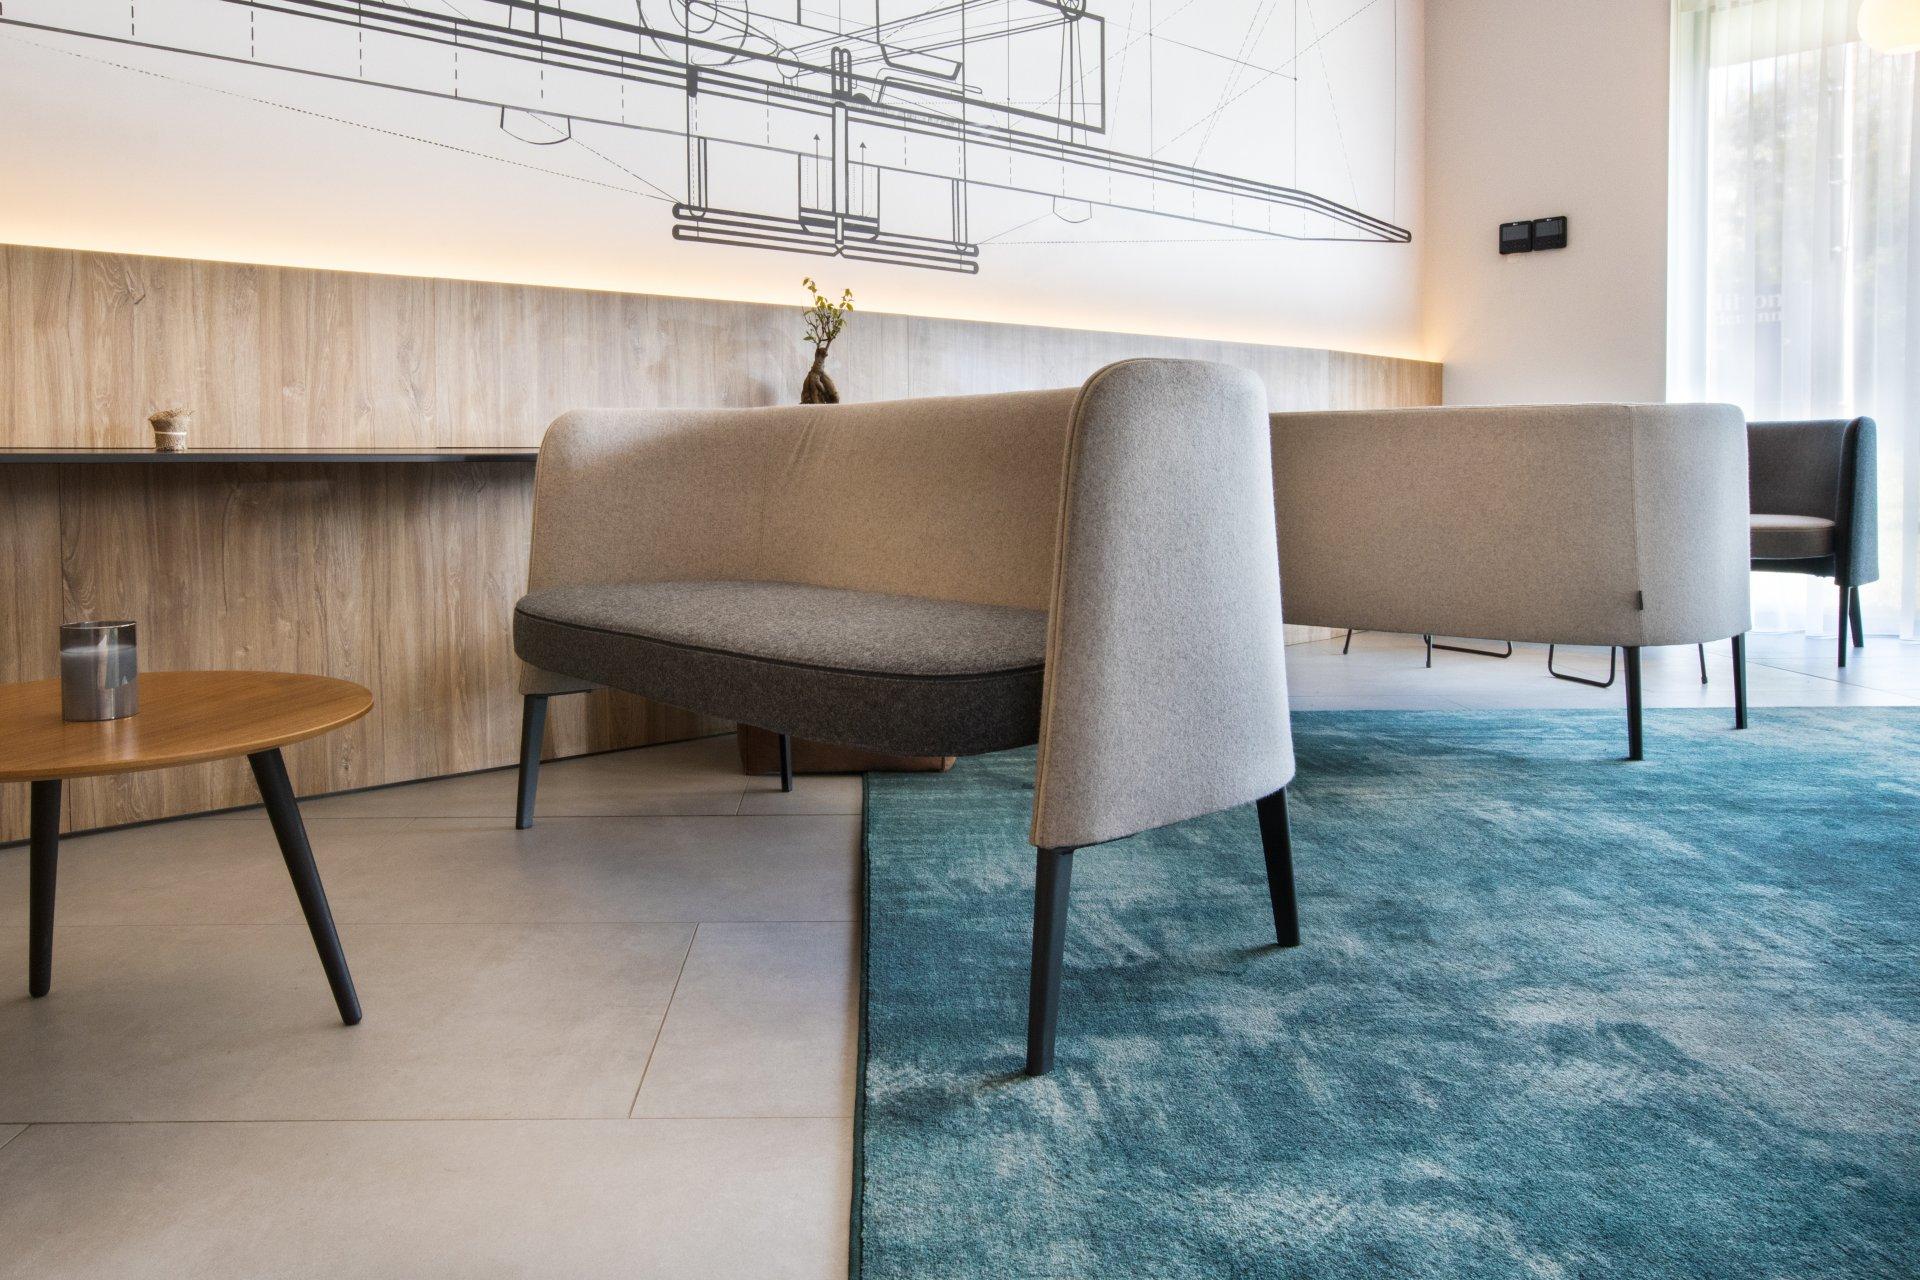 20200625-carpet-and-more-hilton-otopeni-25